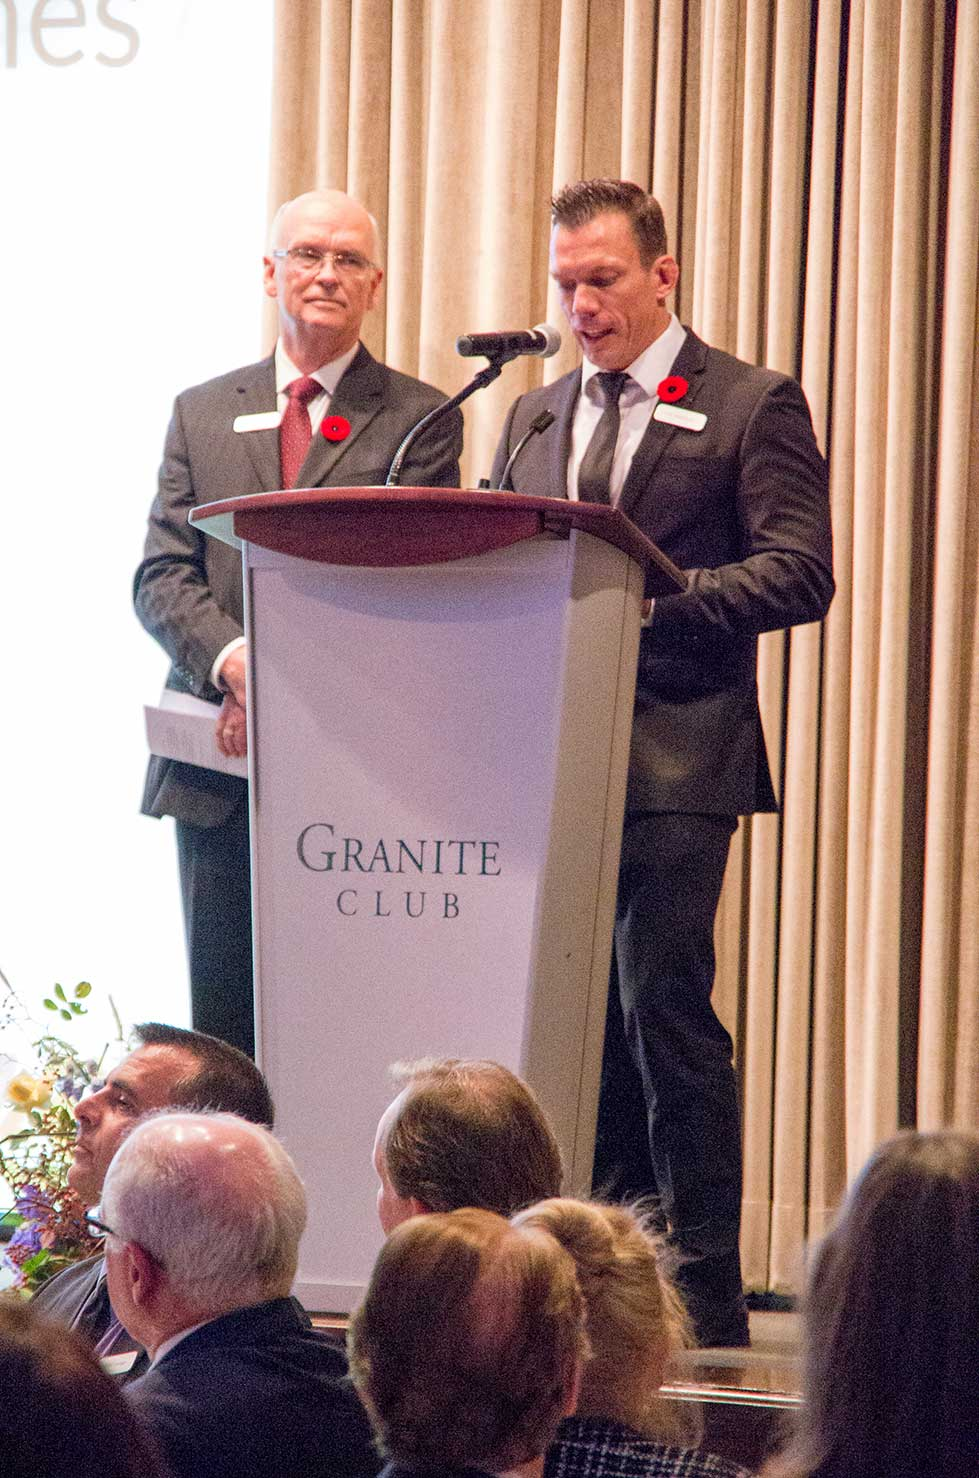 John Mckenzie and Brian Denney